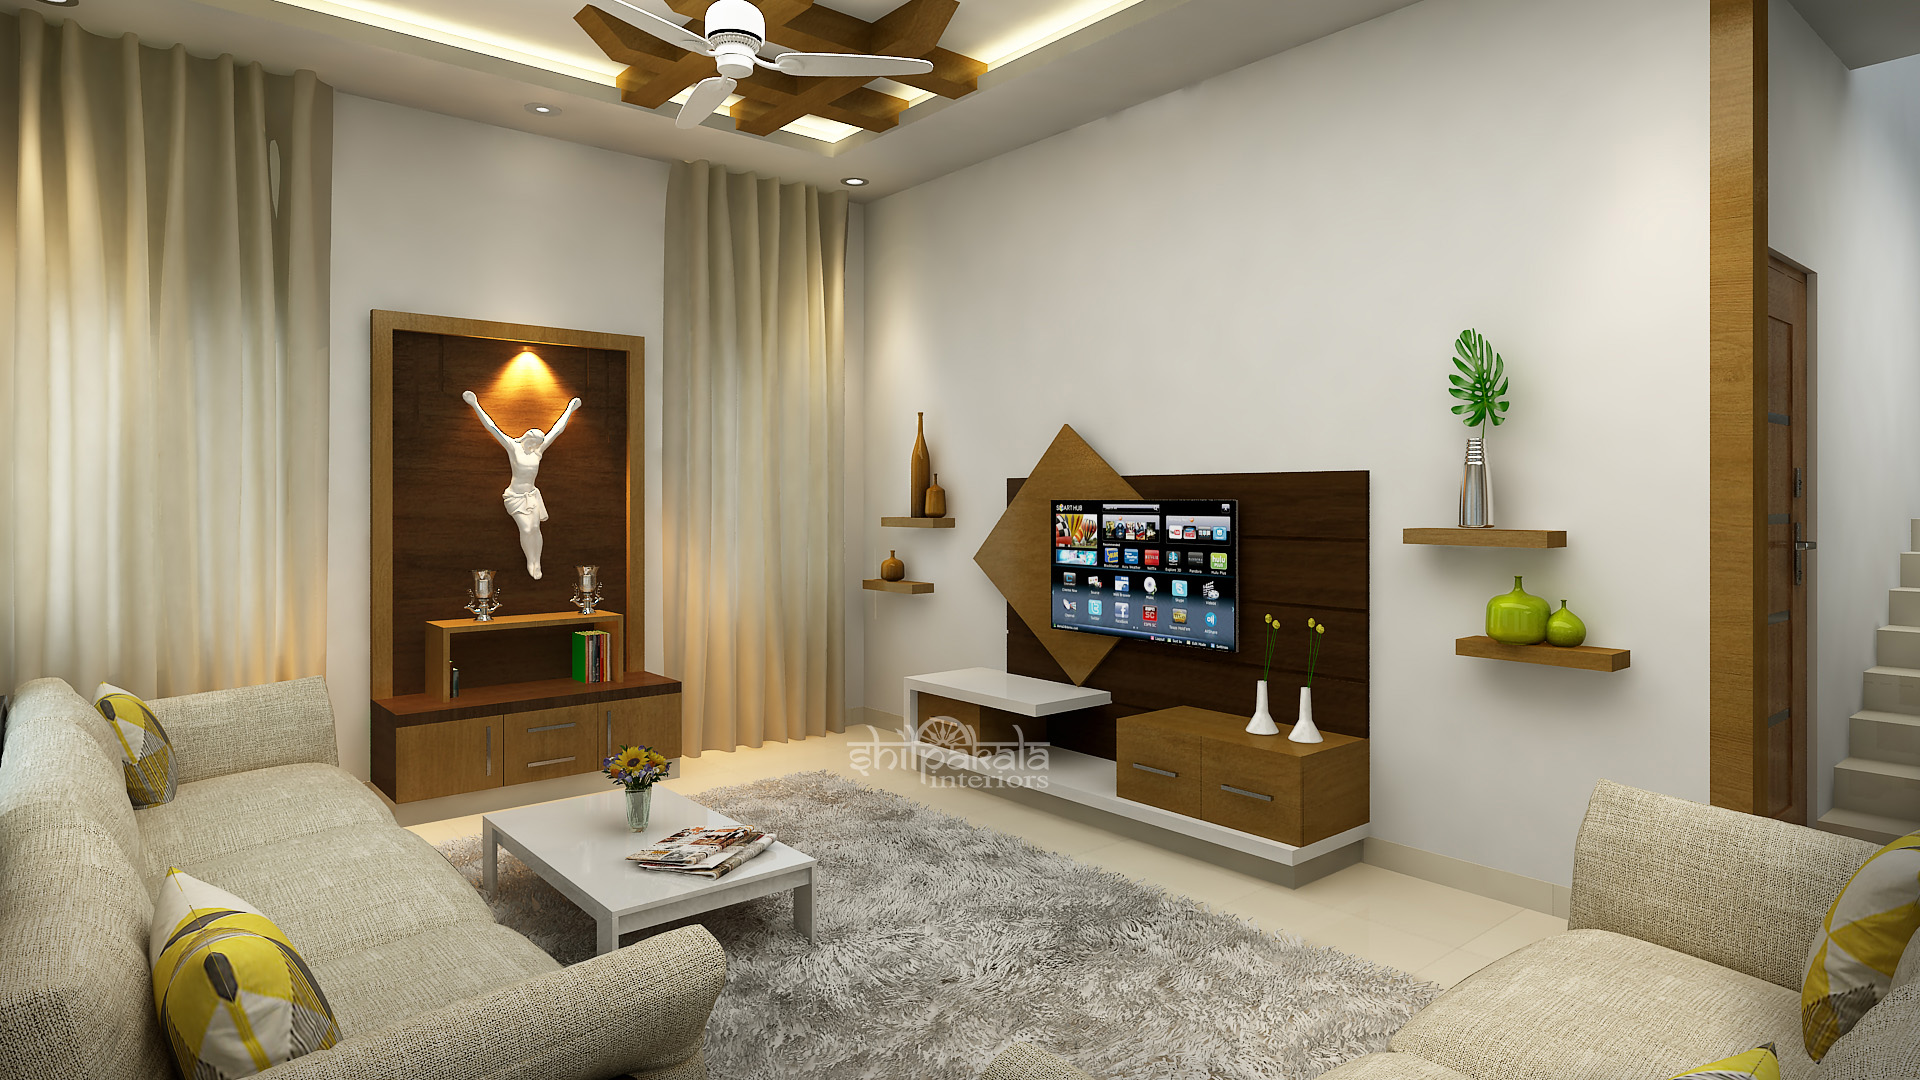 Kerala Home Interior Design Images Gallery